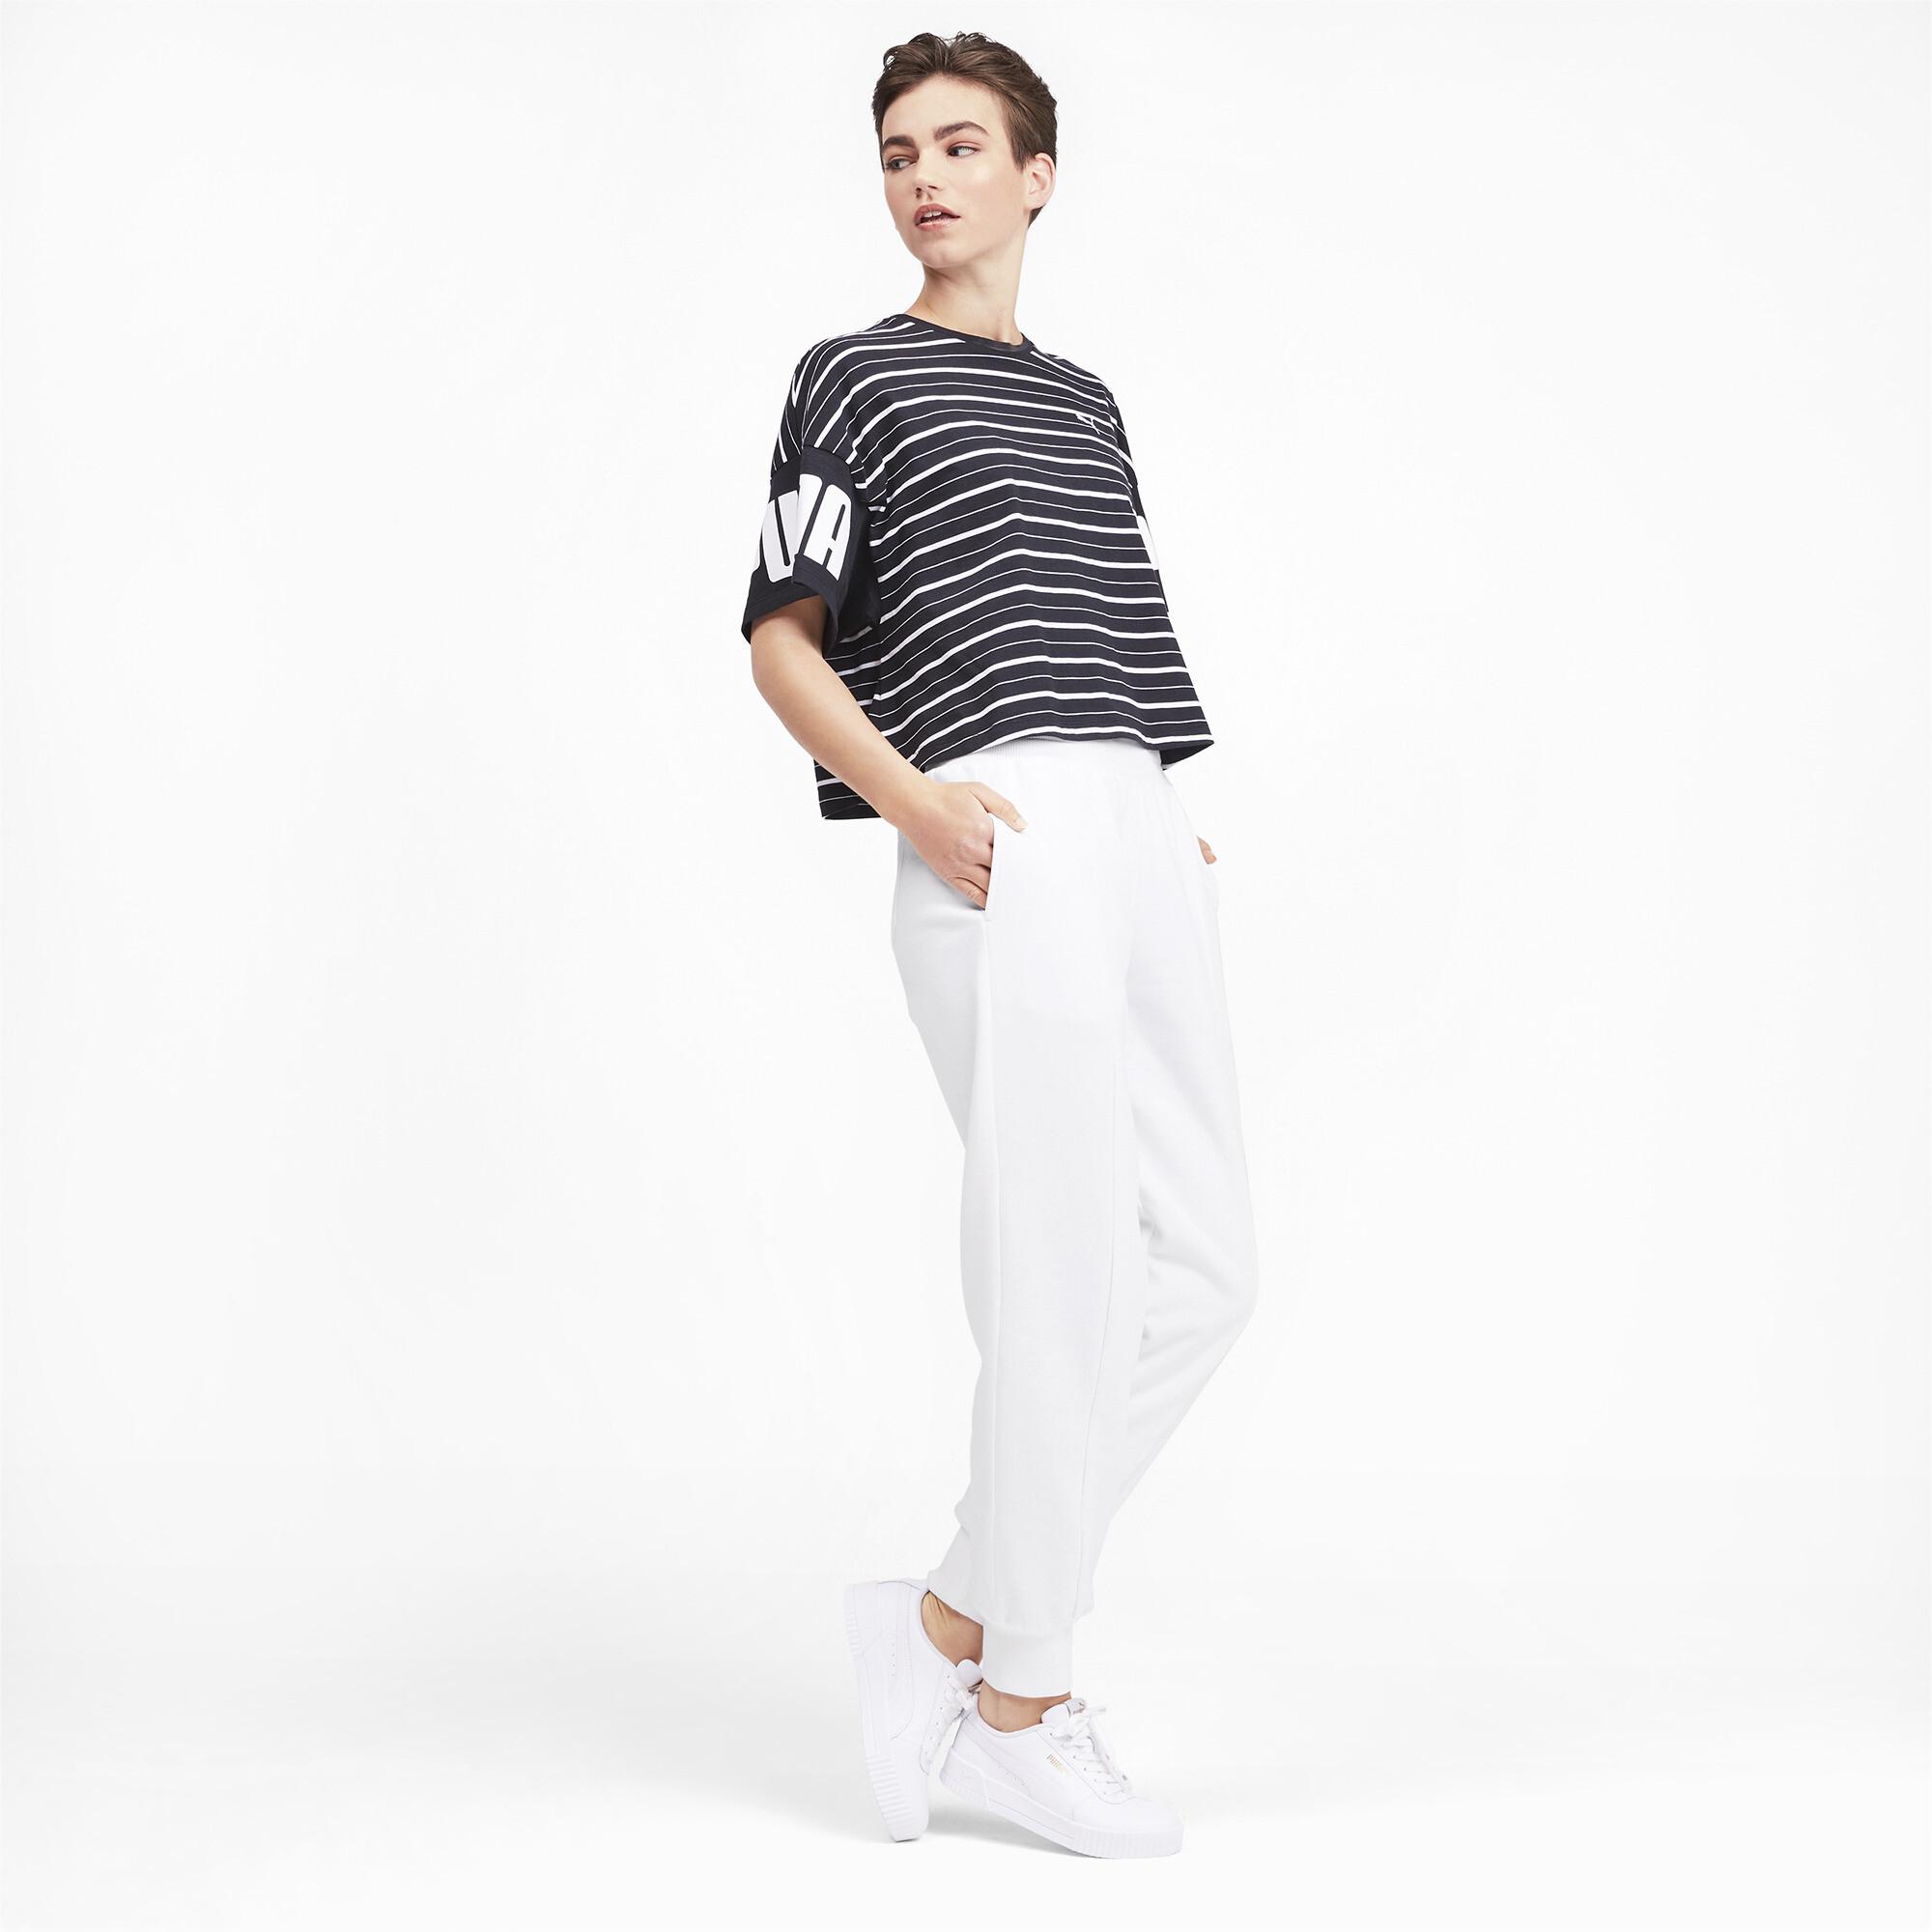 PUMA-Rebel-Women-039-s-Sweatpants-Women-Knitted-Pants-Basics thumbnail 11